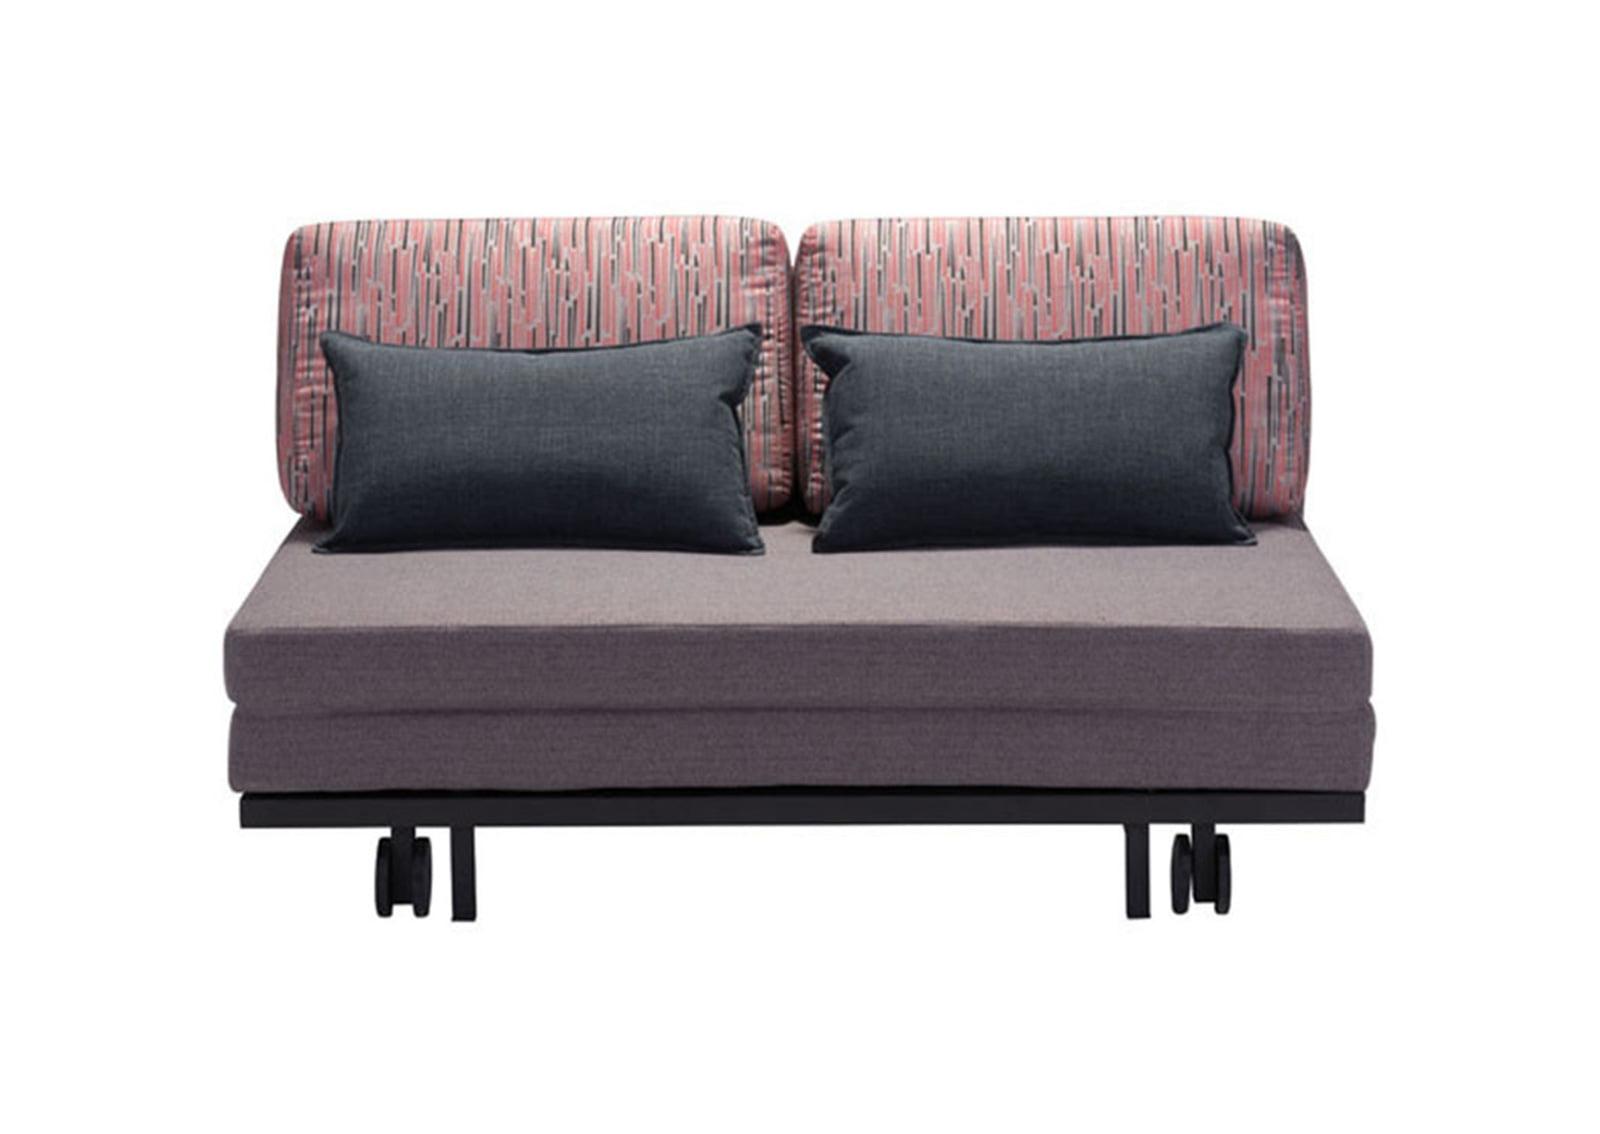 beach print sleeper sofas y sillones baratos guadalajara felicity sofa gray with red furnishplus